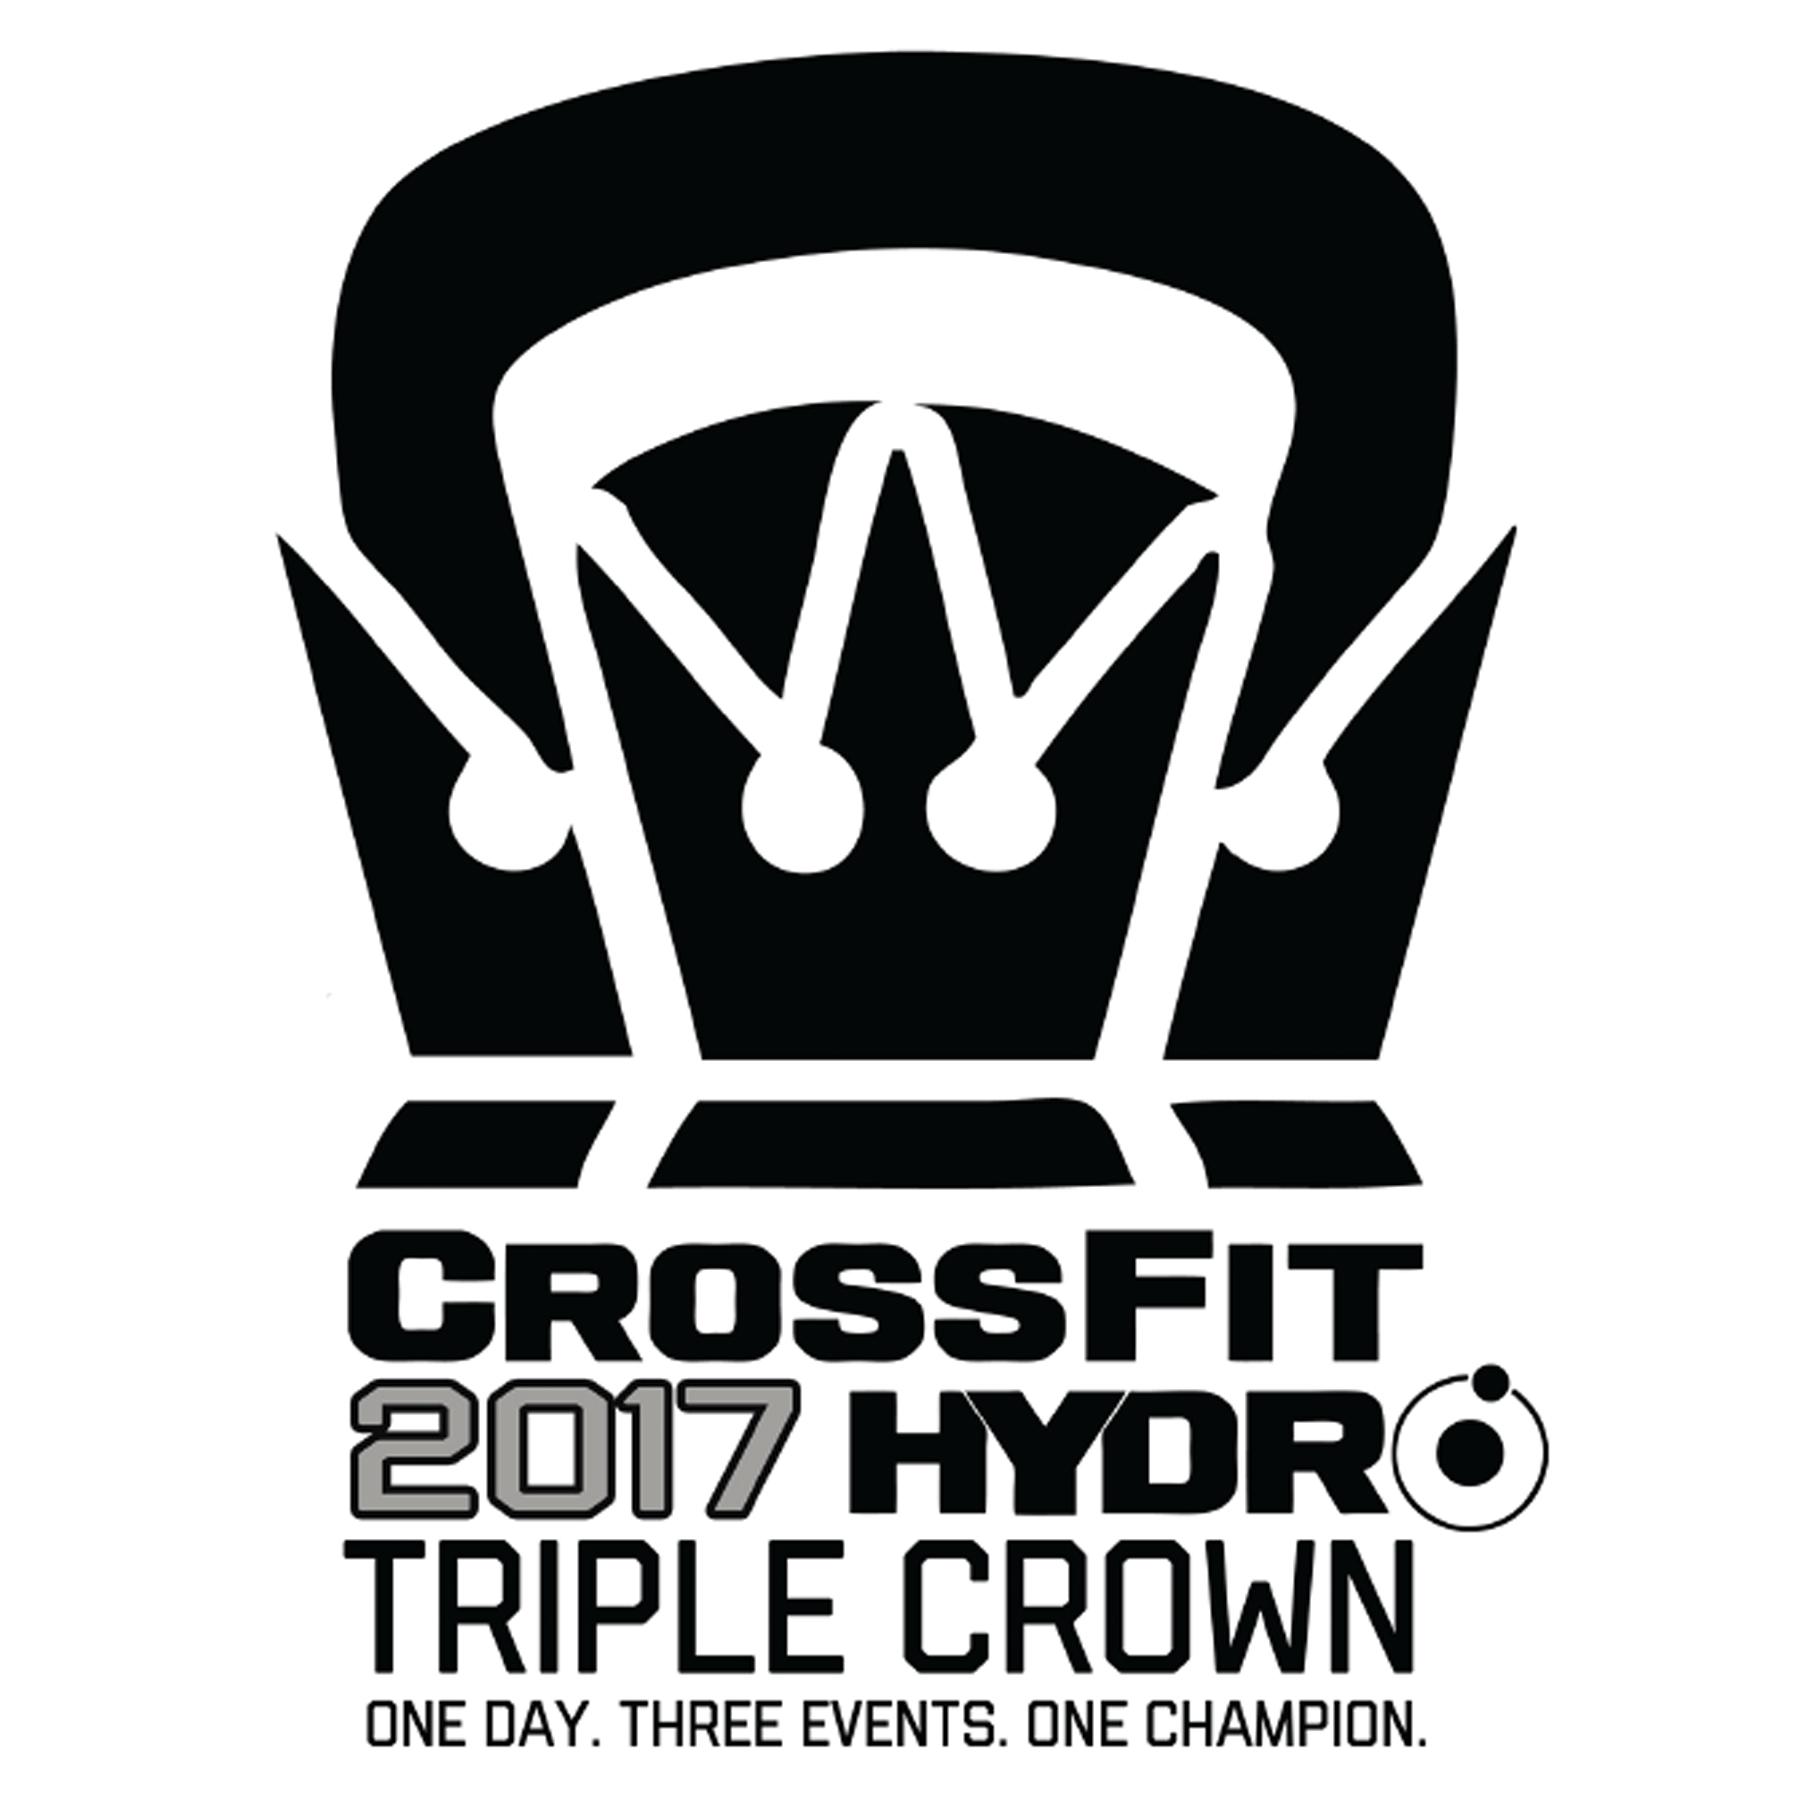 CROSSFIT HYDRO EVENT BRANDING